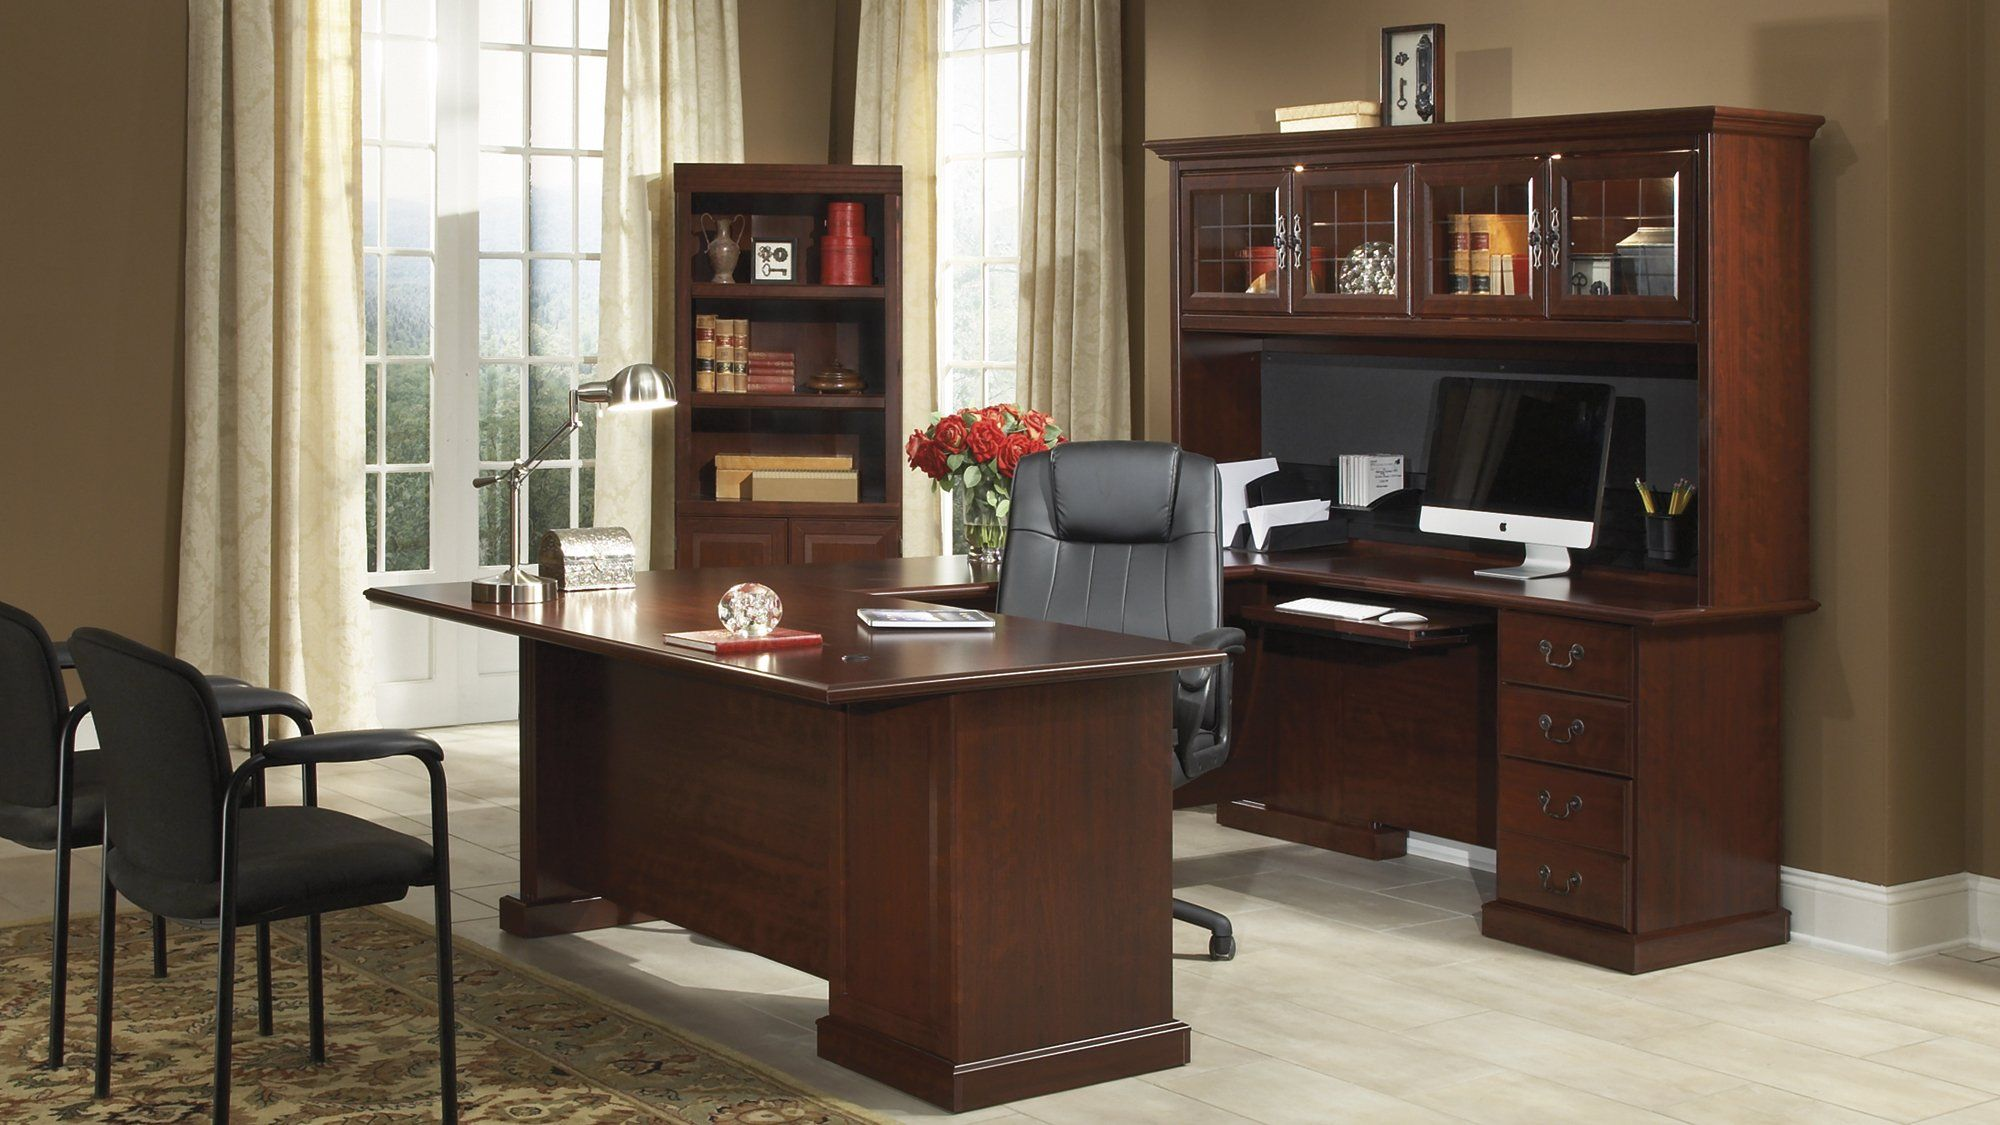 Sauder 109843 Heritage Hill Classic Cherry 4 Pcs Office Set Home